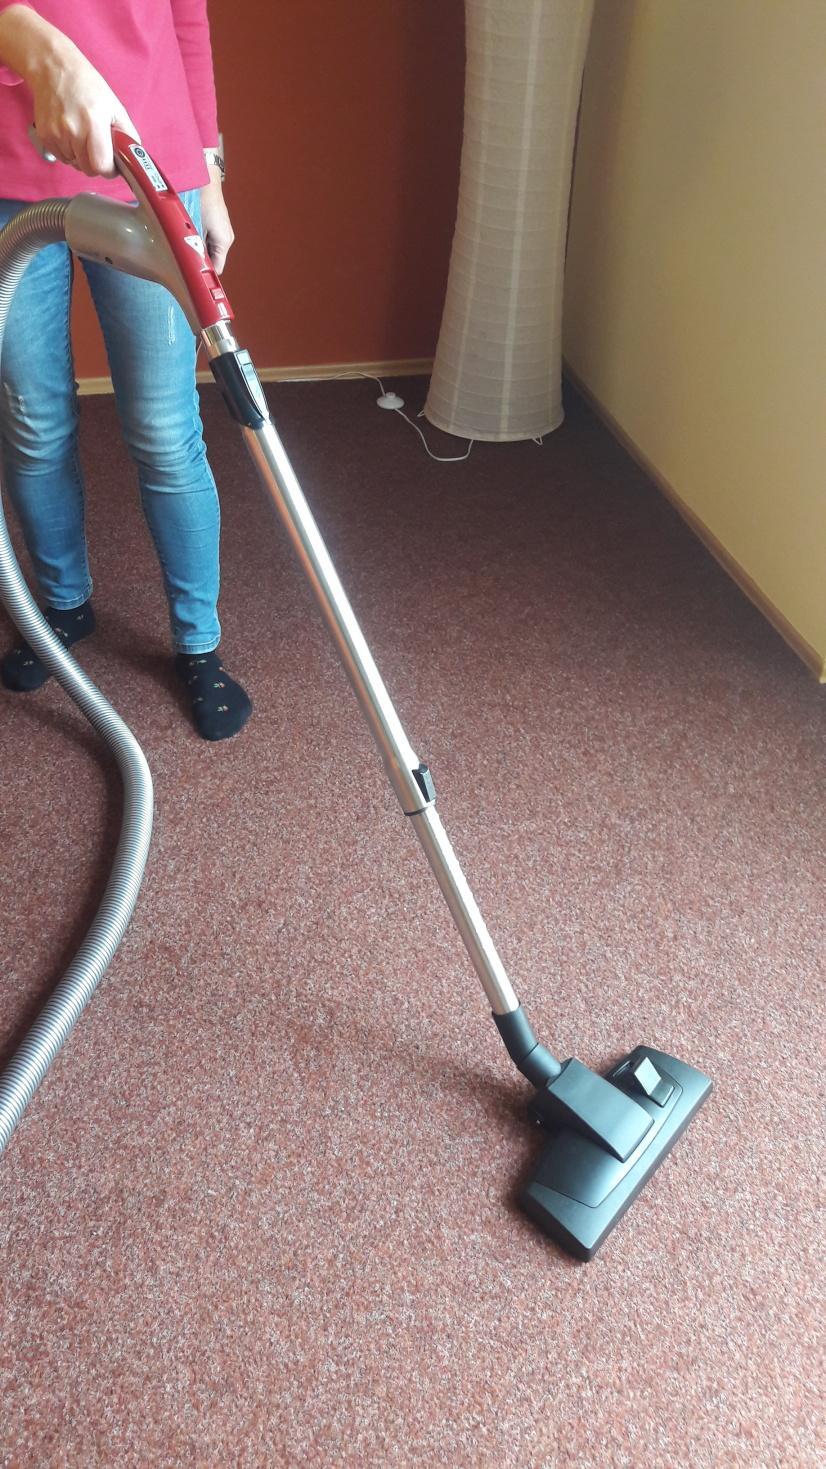 podlahova-hubica-na-koberec